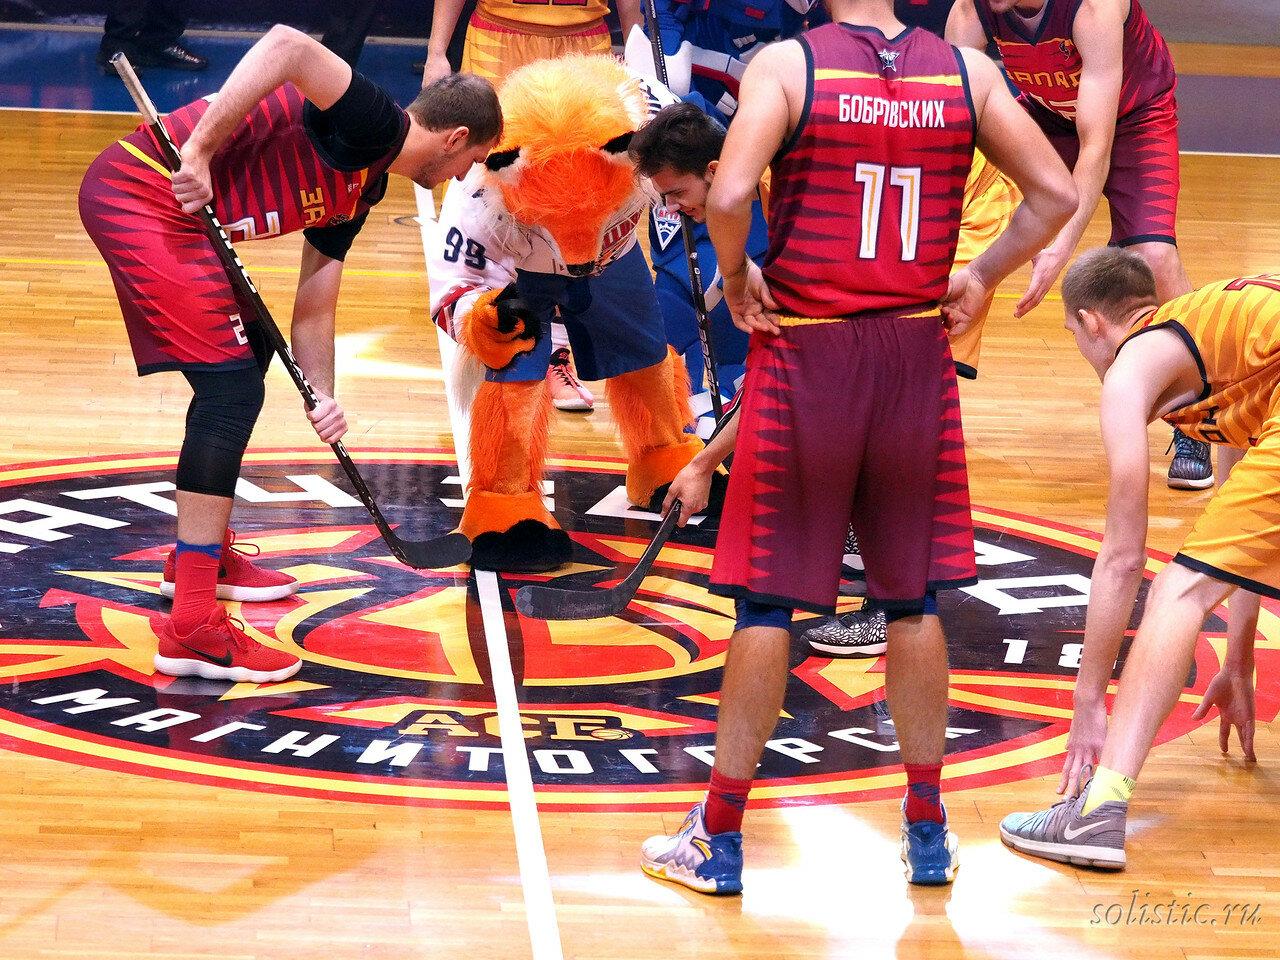 52 Матч звезд АСБ 2018 (ассоциации студенческого баскетбола)